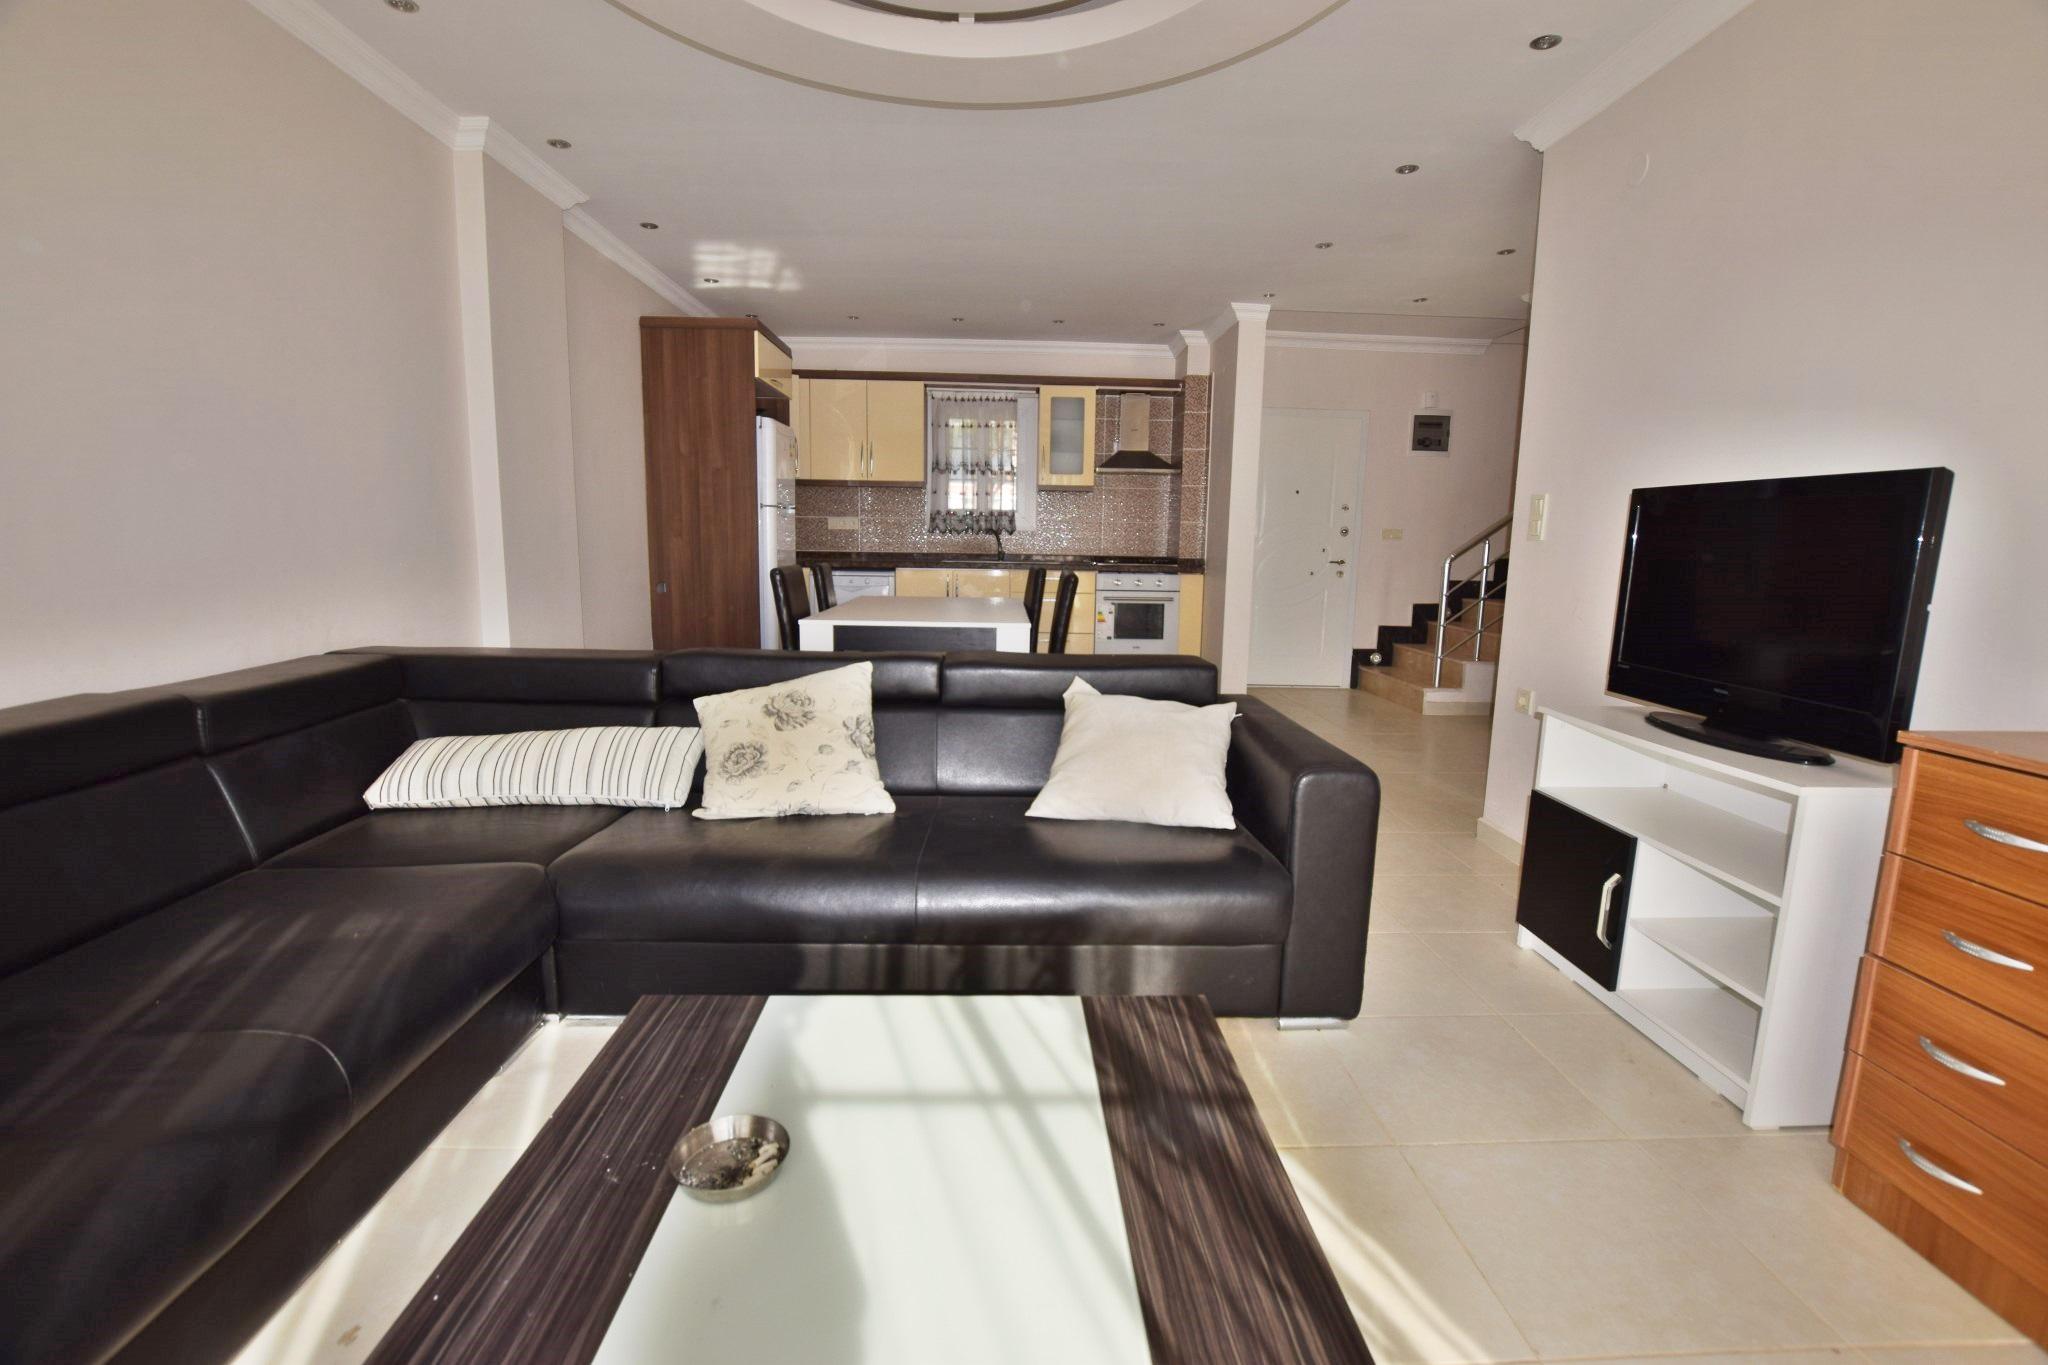 3-Bed Duplex in Akbuk